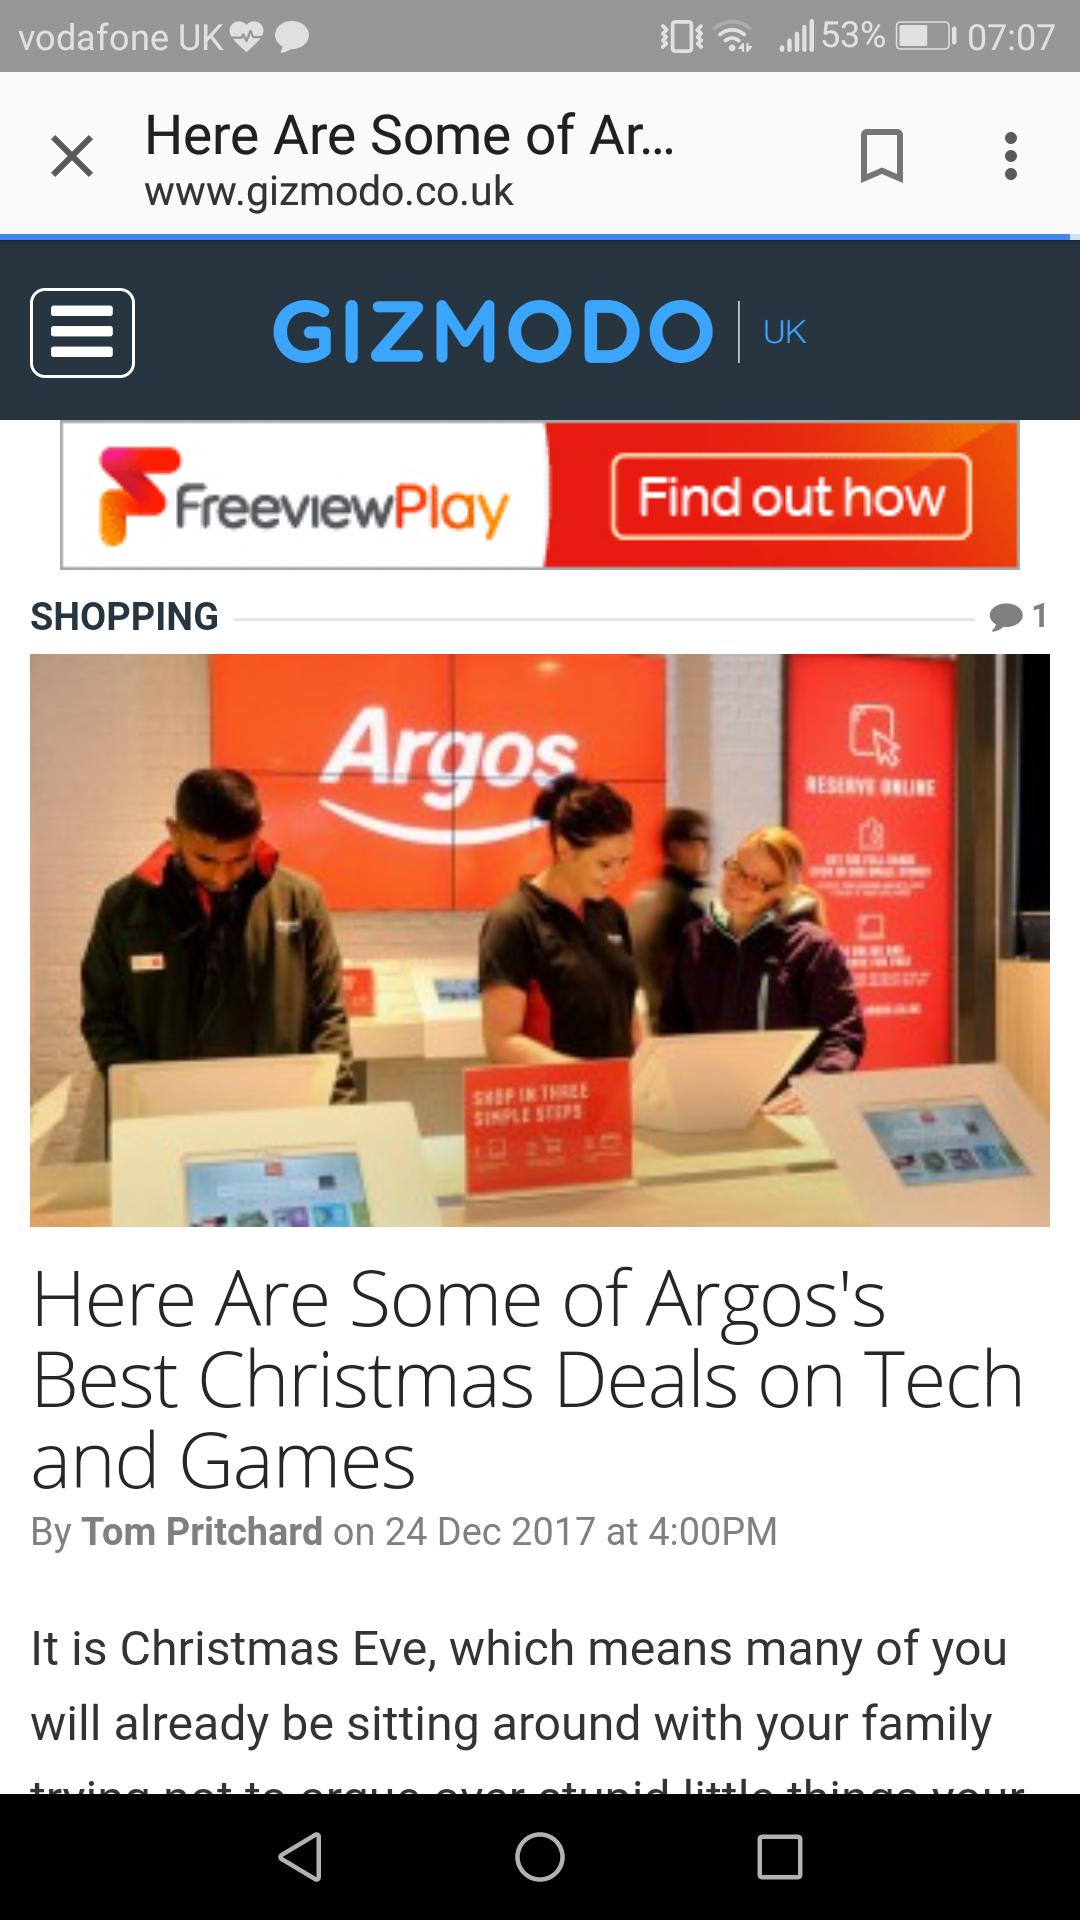 ARGOS BEST DEALS - List below